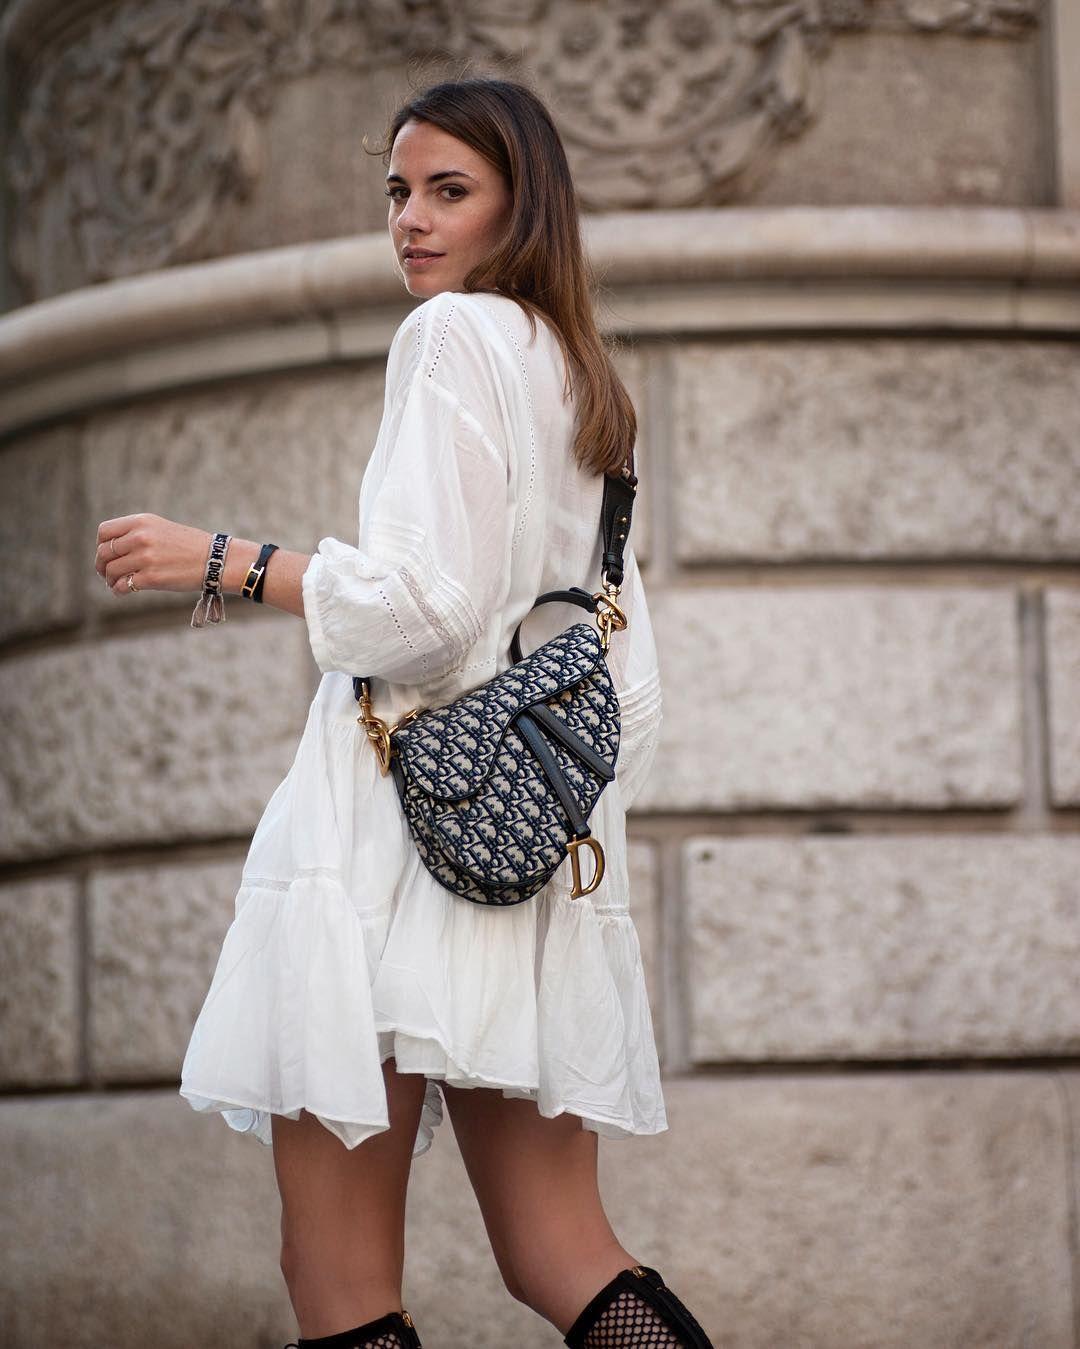 Top 5 Fashionable Handbags 2023 Worth Investing